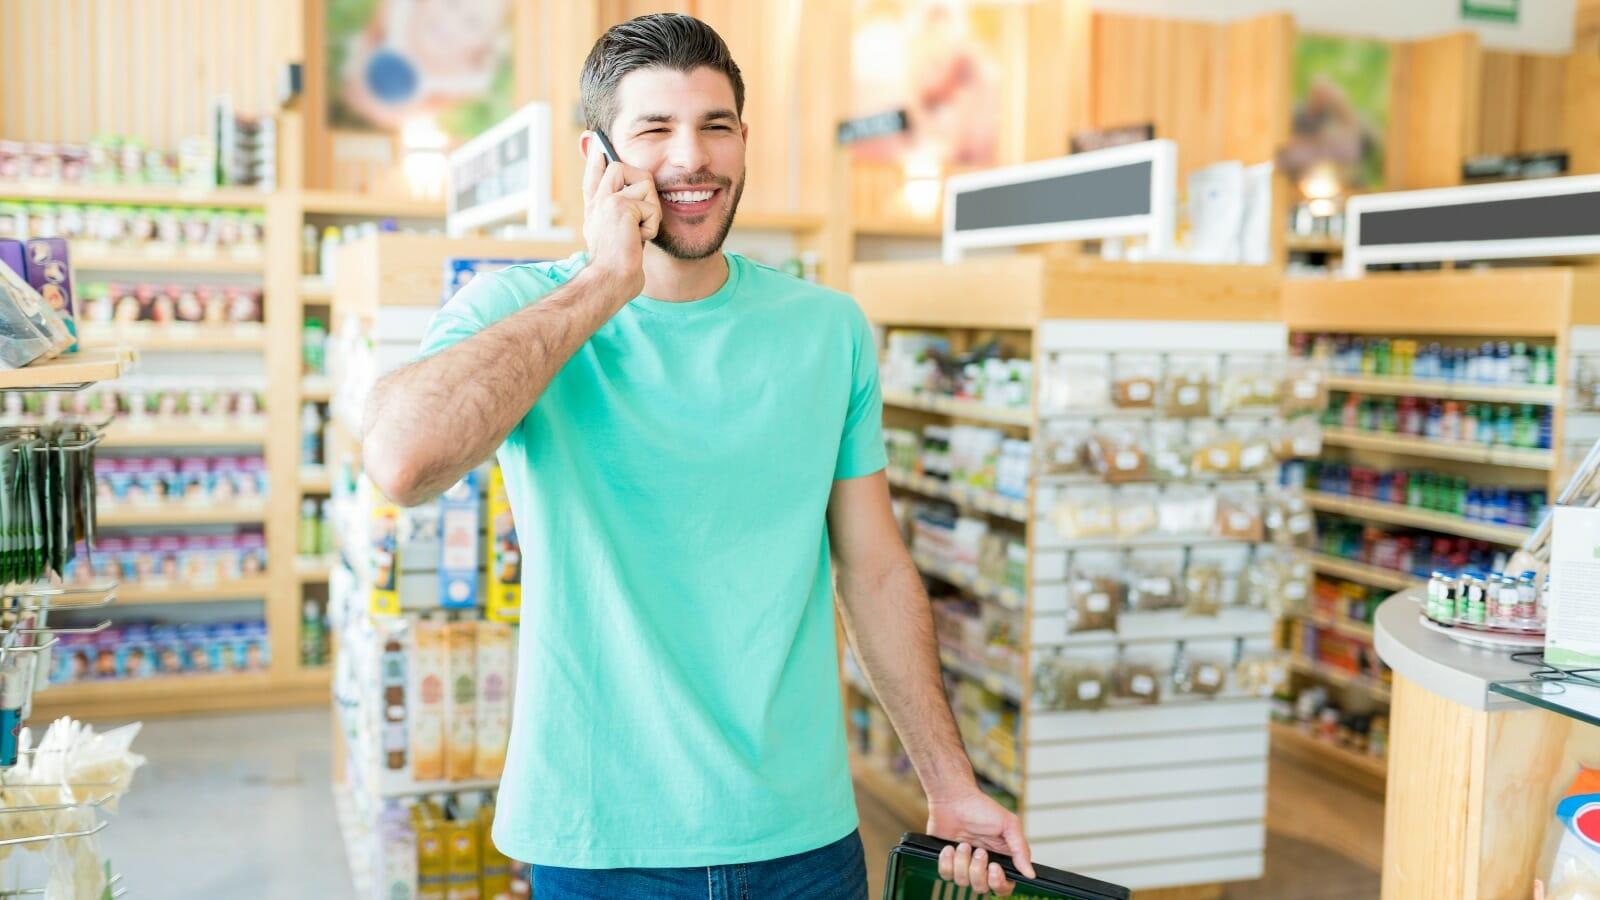 queue callback - man on phone in line